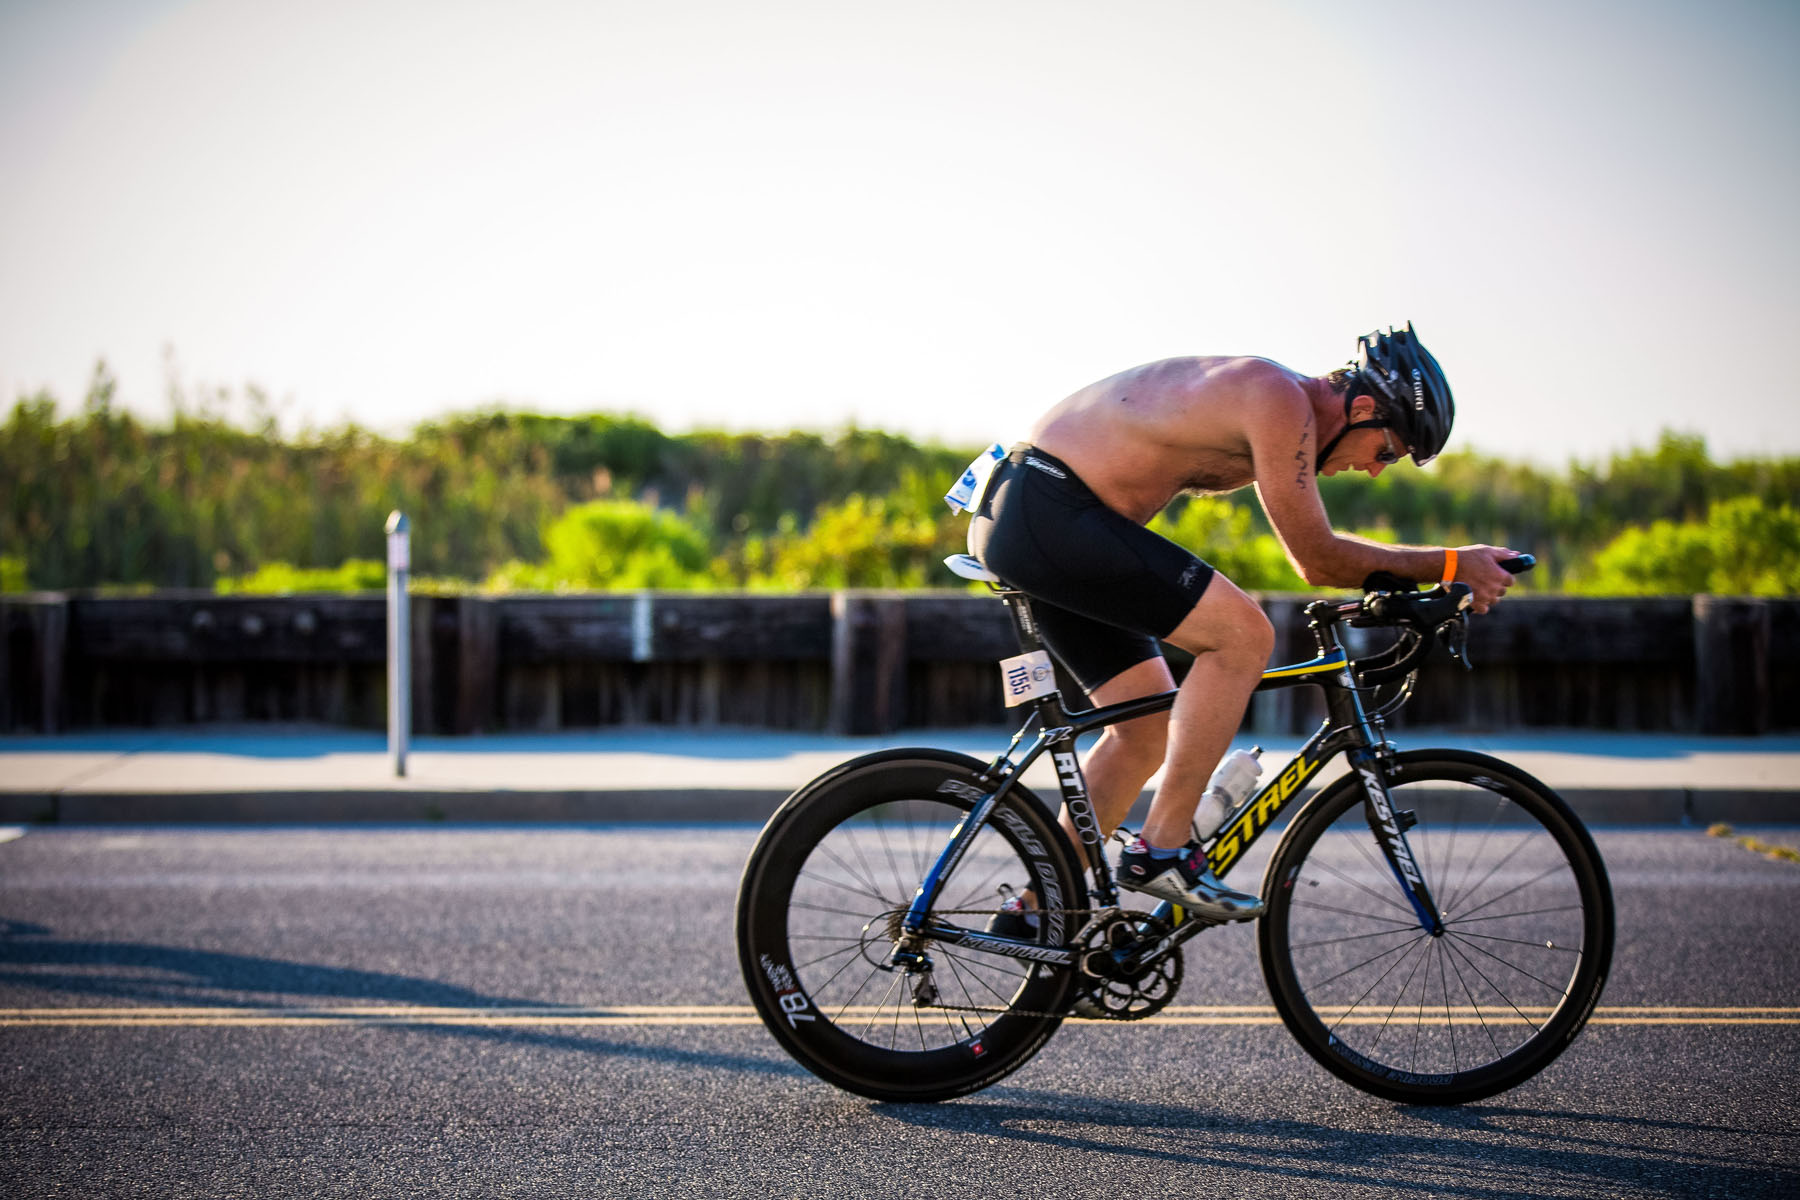 Tri The Wildwoods New Jersey Triathlon - Biking shirtless enjoy the beach sun rays